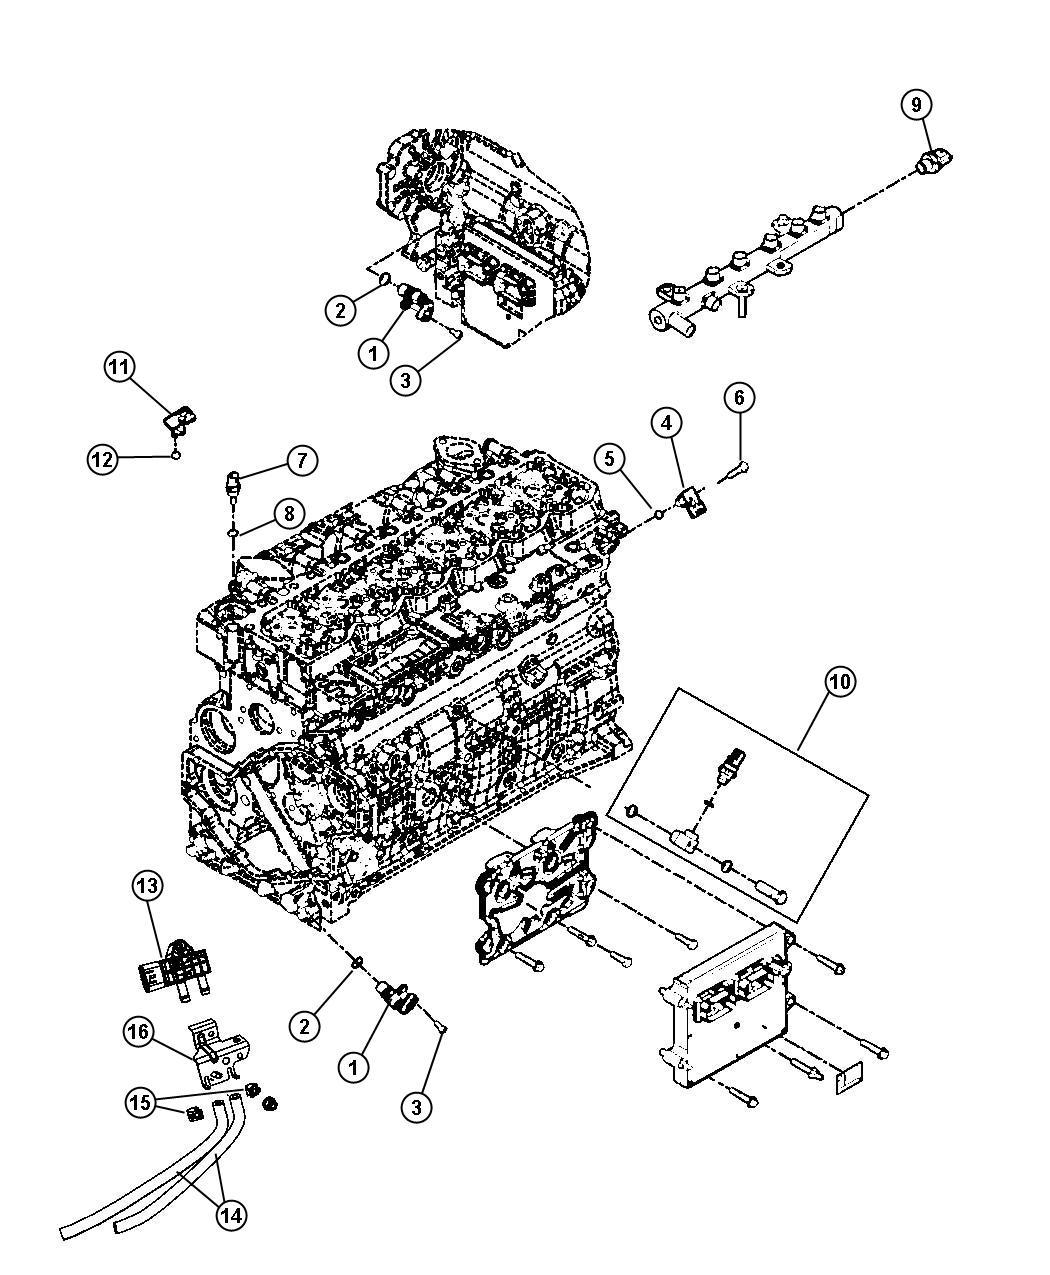 1998 Dodge Ram 1500 Sensor. Temperature sending unit